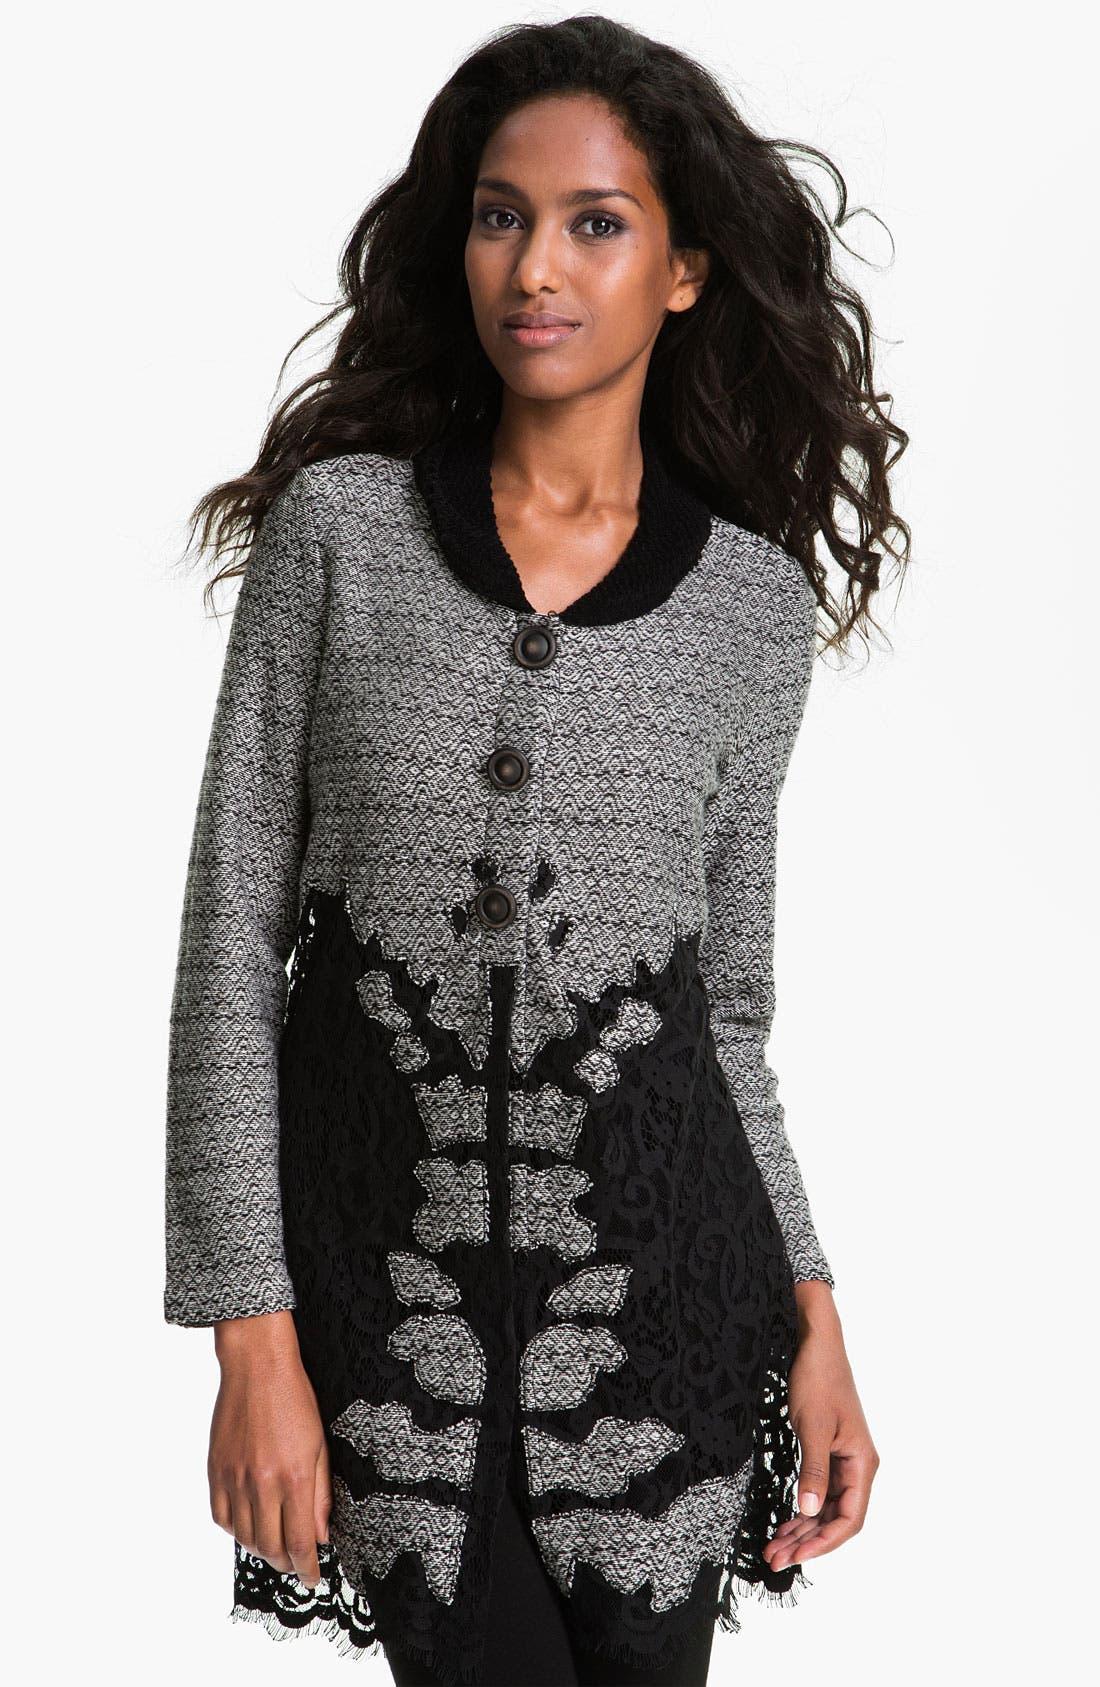 Alternate Image 1 Selected - Nic + Zoe Lace Trim Sweater Jacket